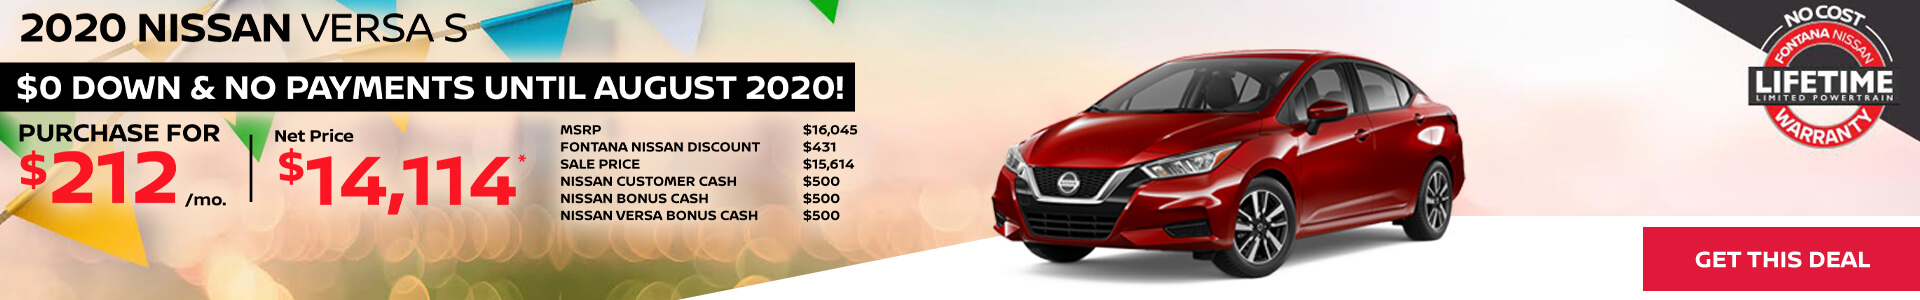 Nissan Versa $212